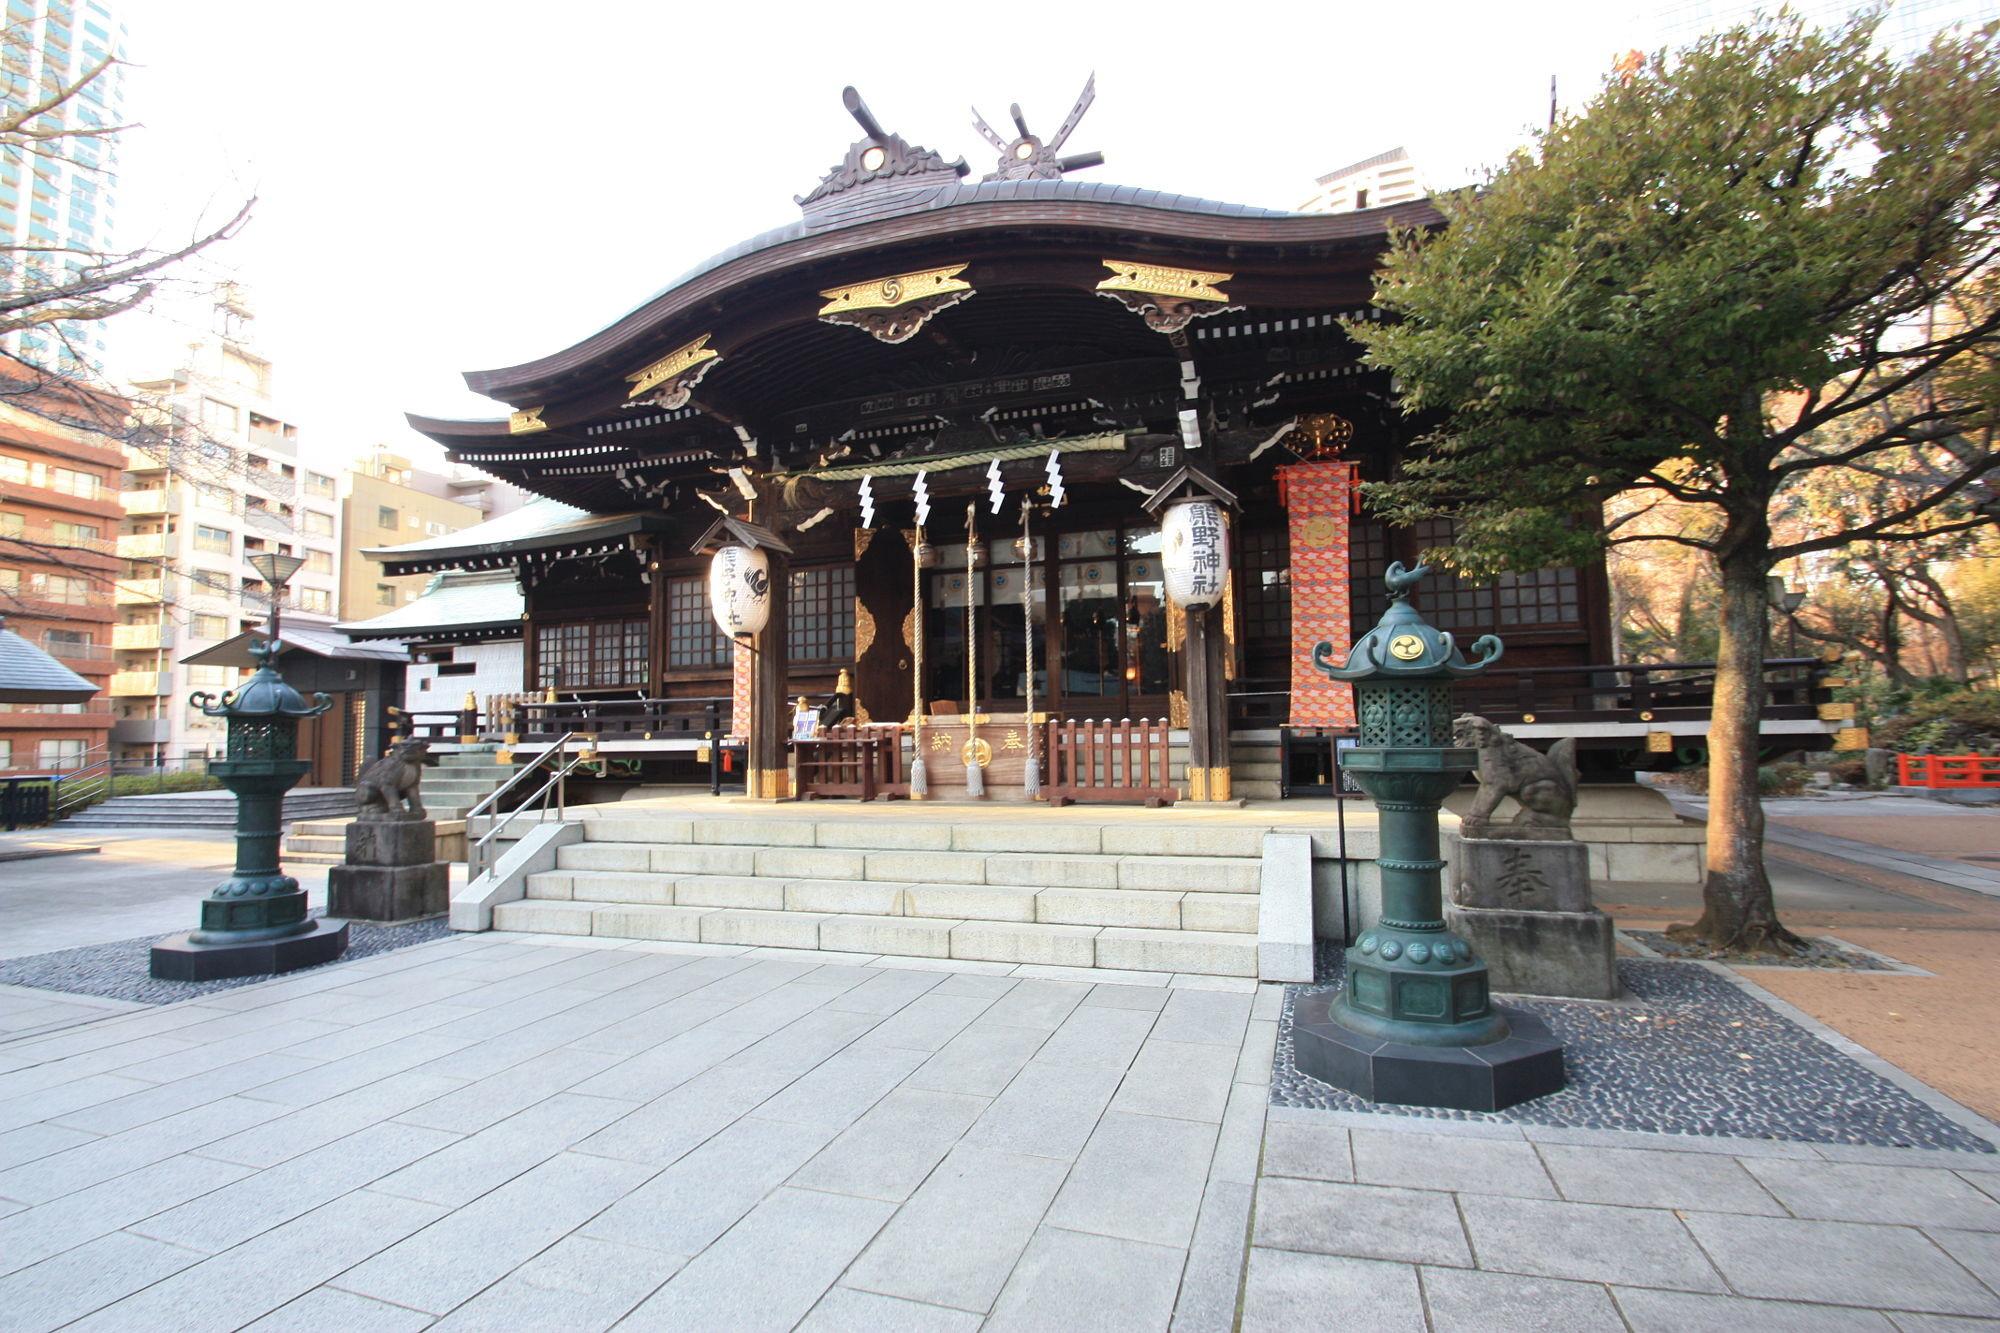 十二社熊野神社の拝殿